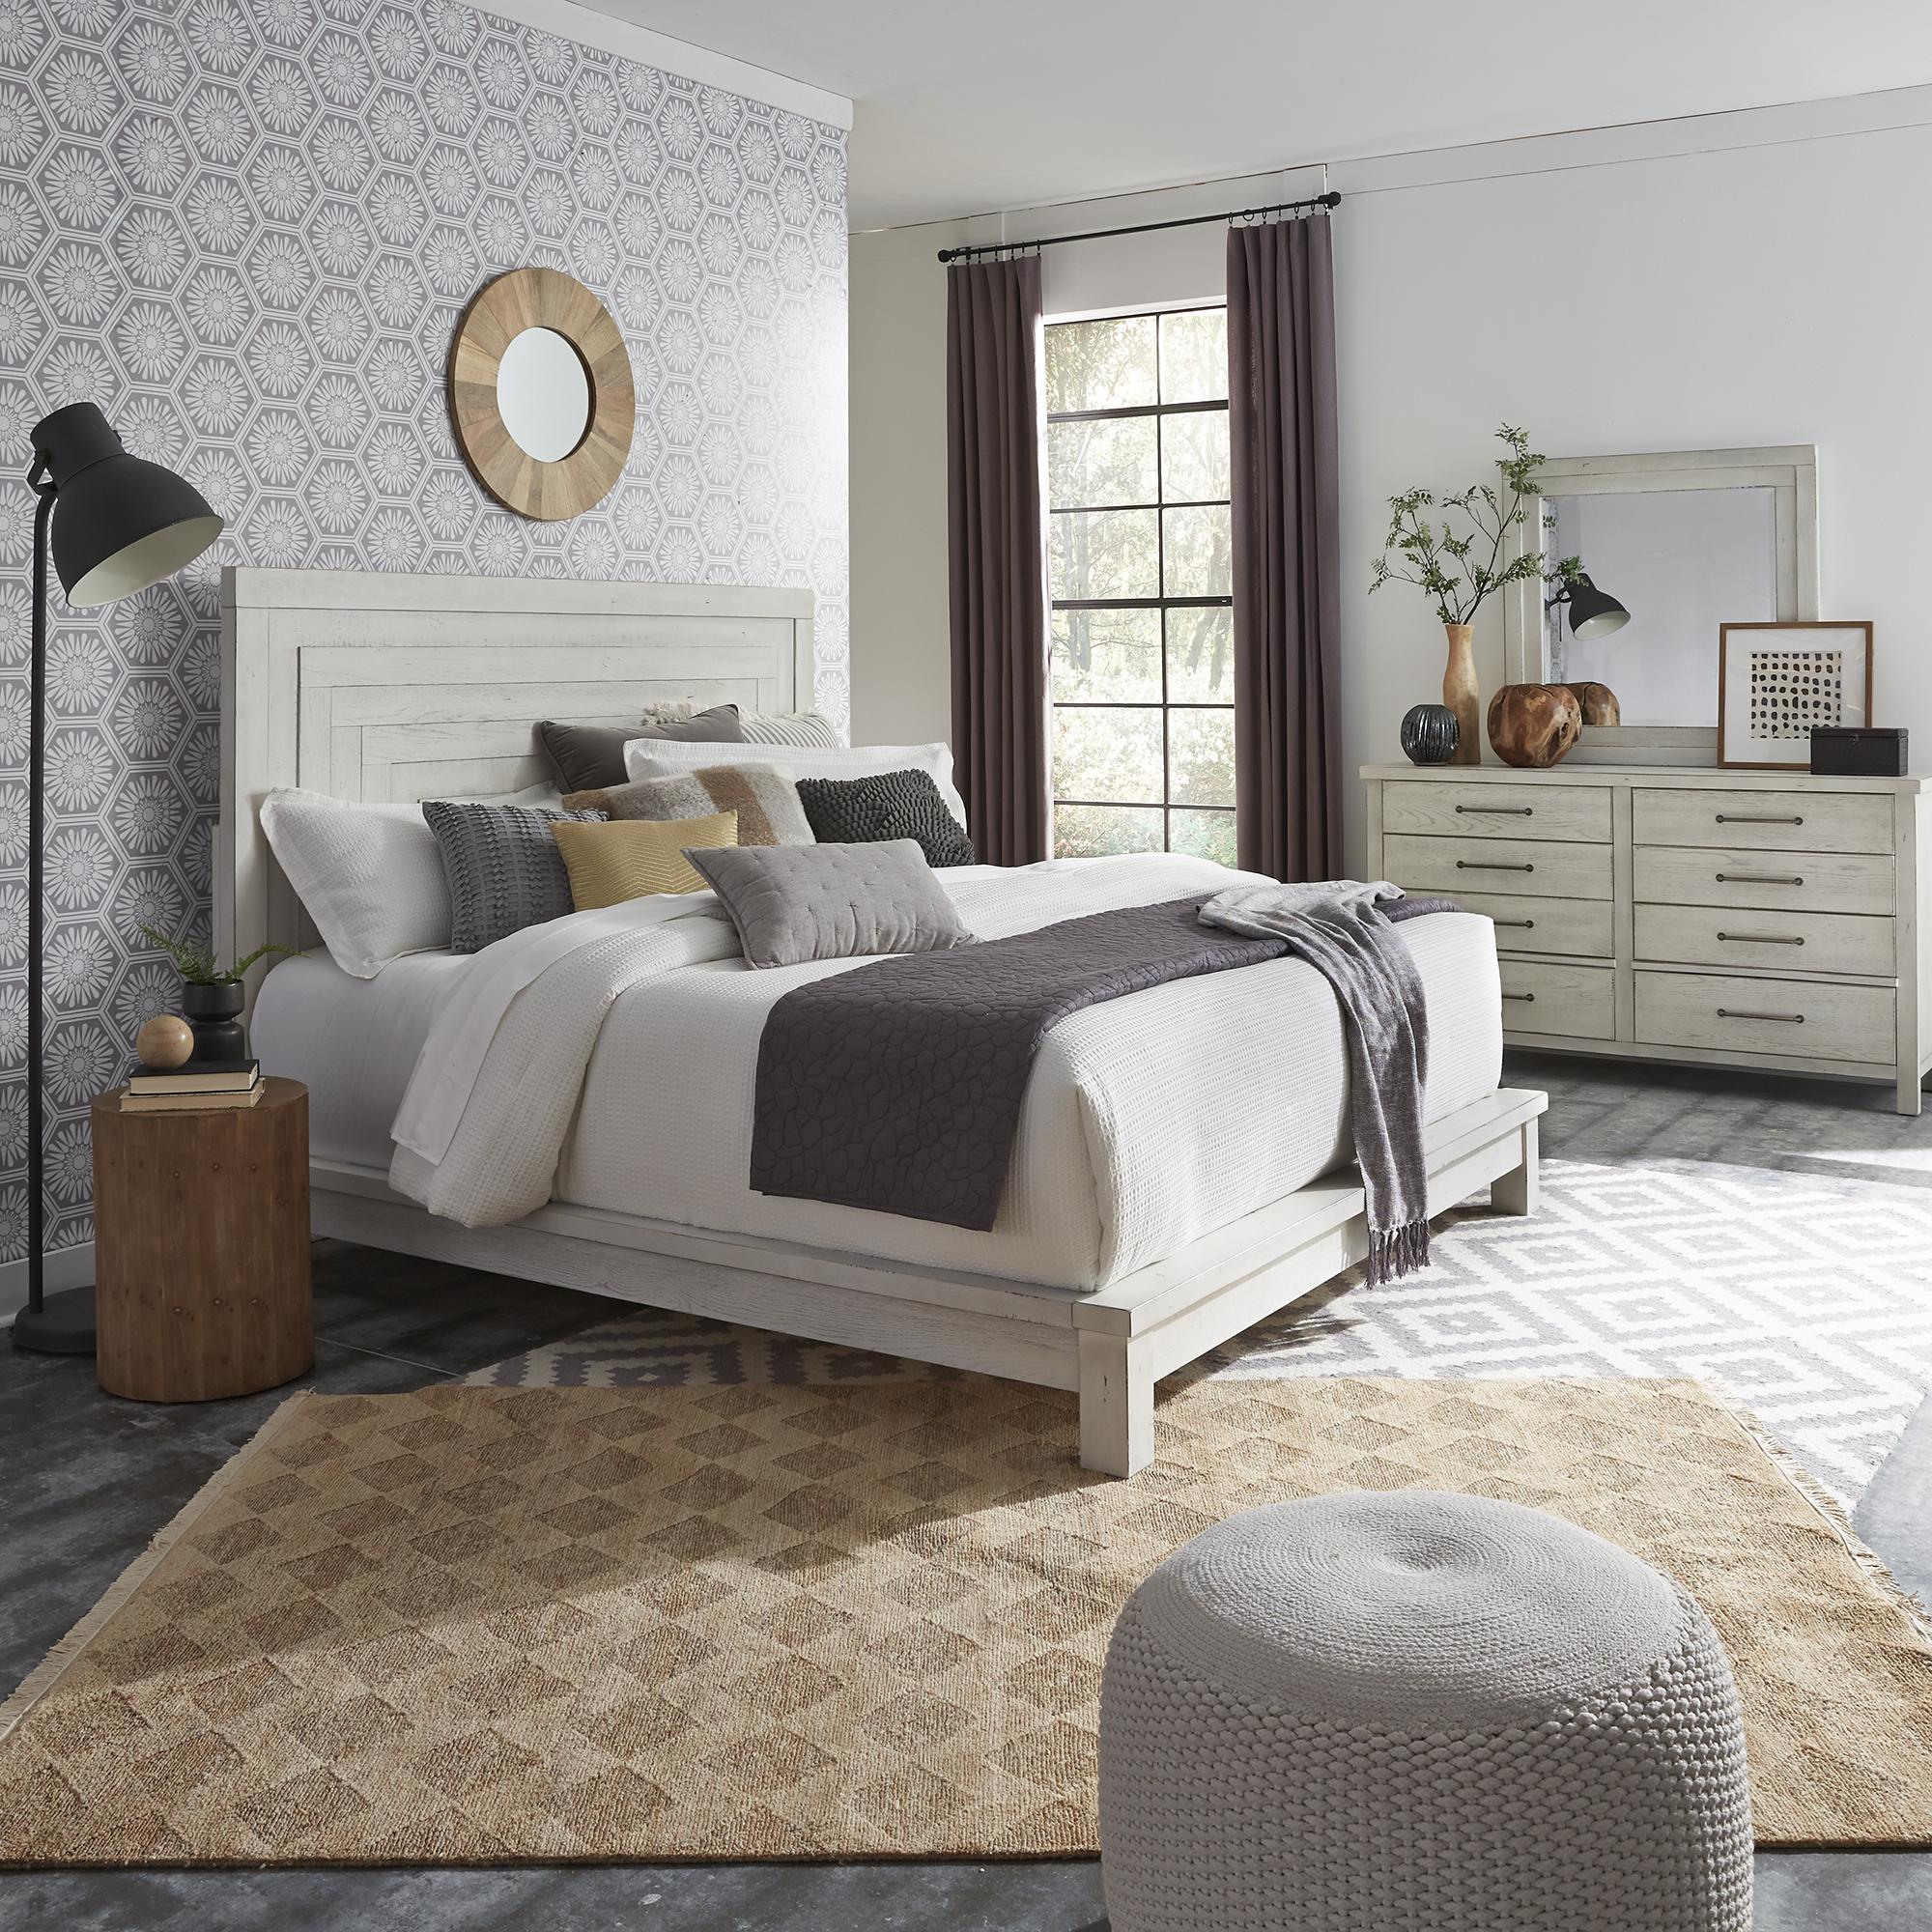 Modern Farmhouse King Platform Bed Dresser Mirror By Liberty Furniture 406w Br Kpldm Northern Mattress Furniture 1st